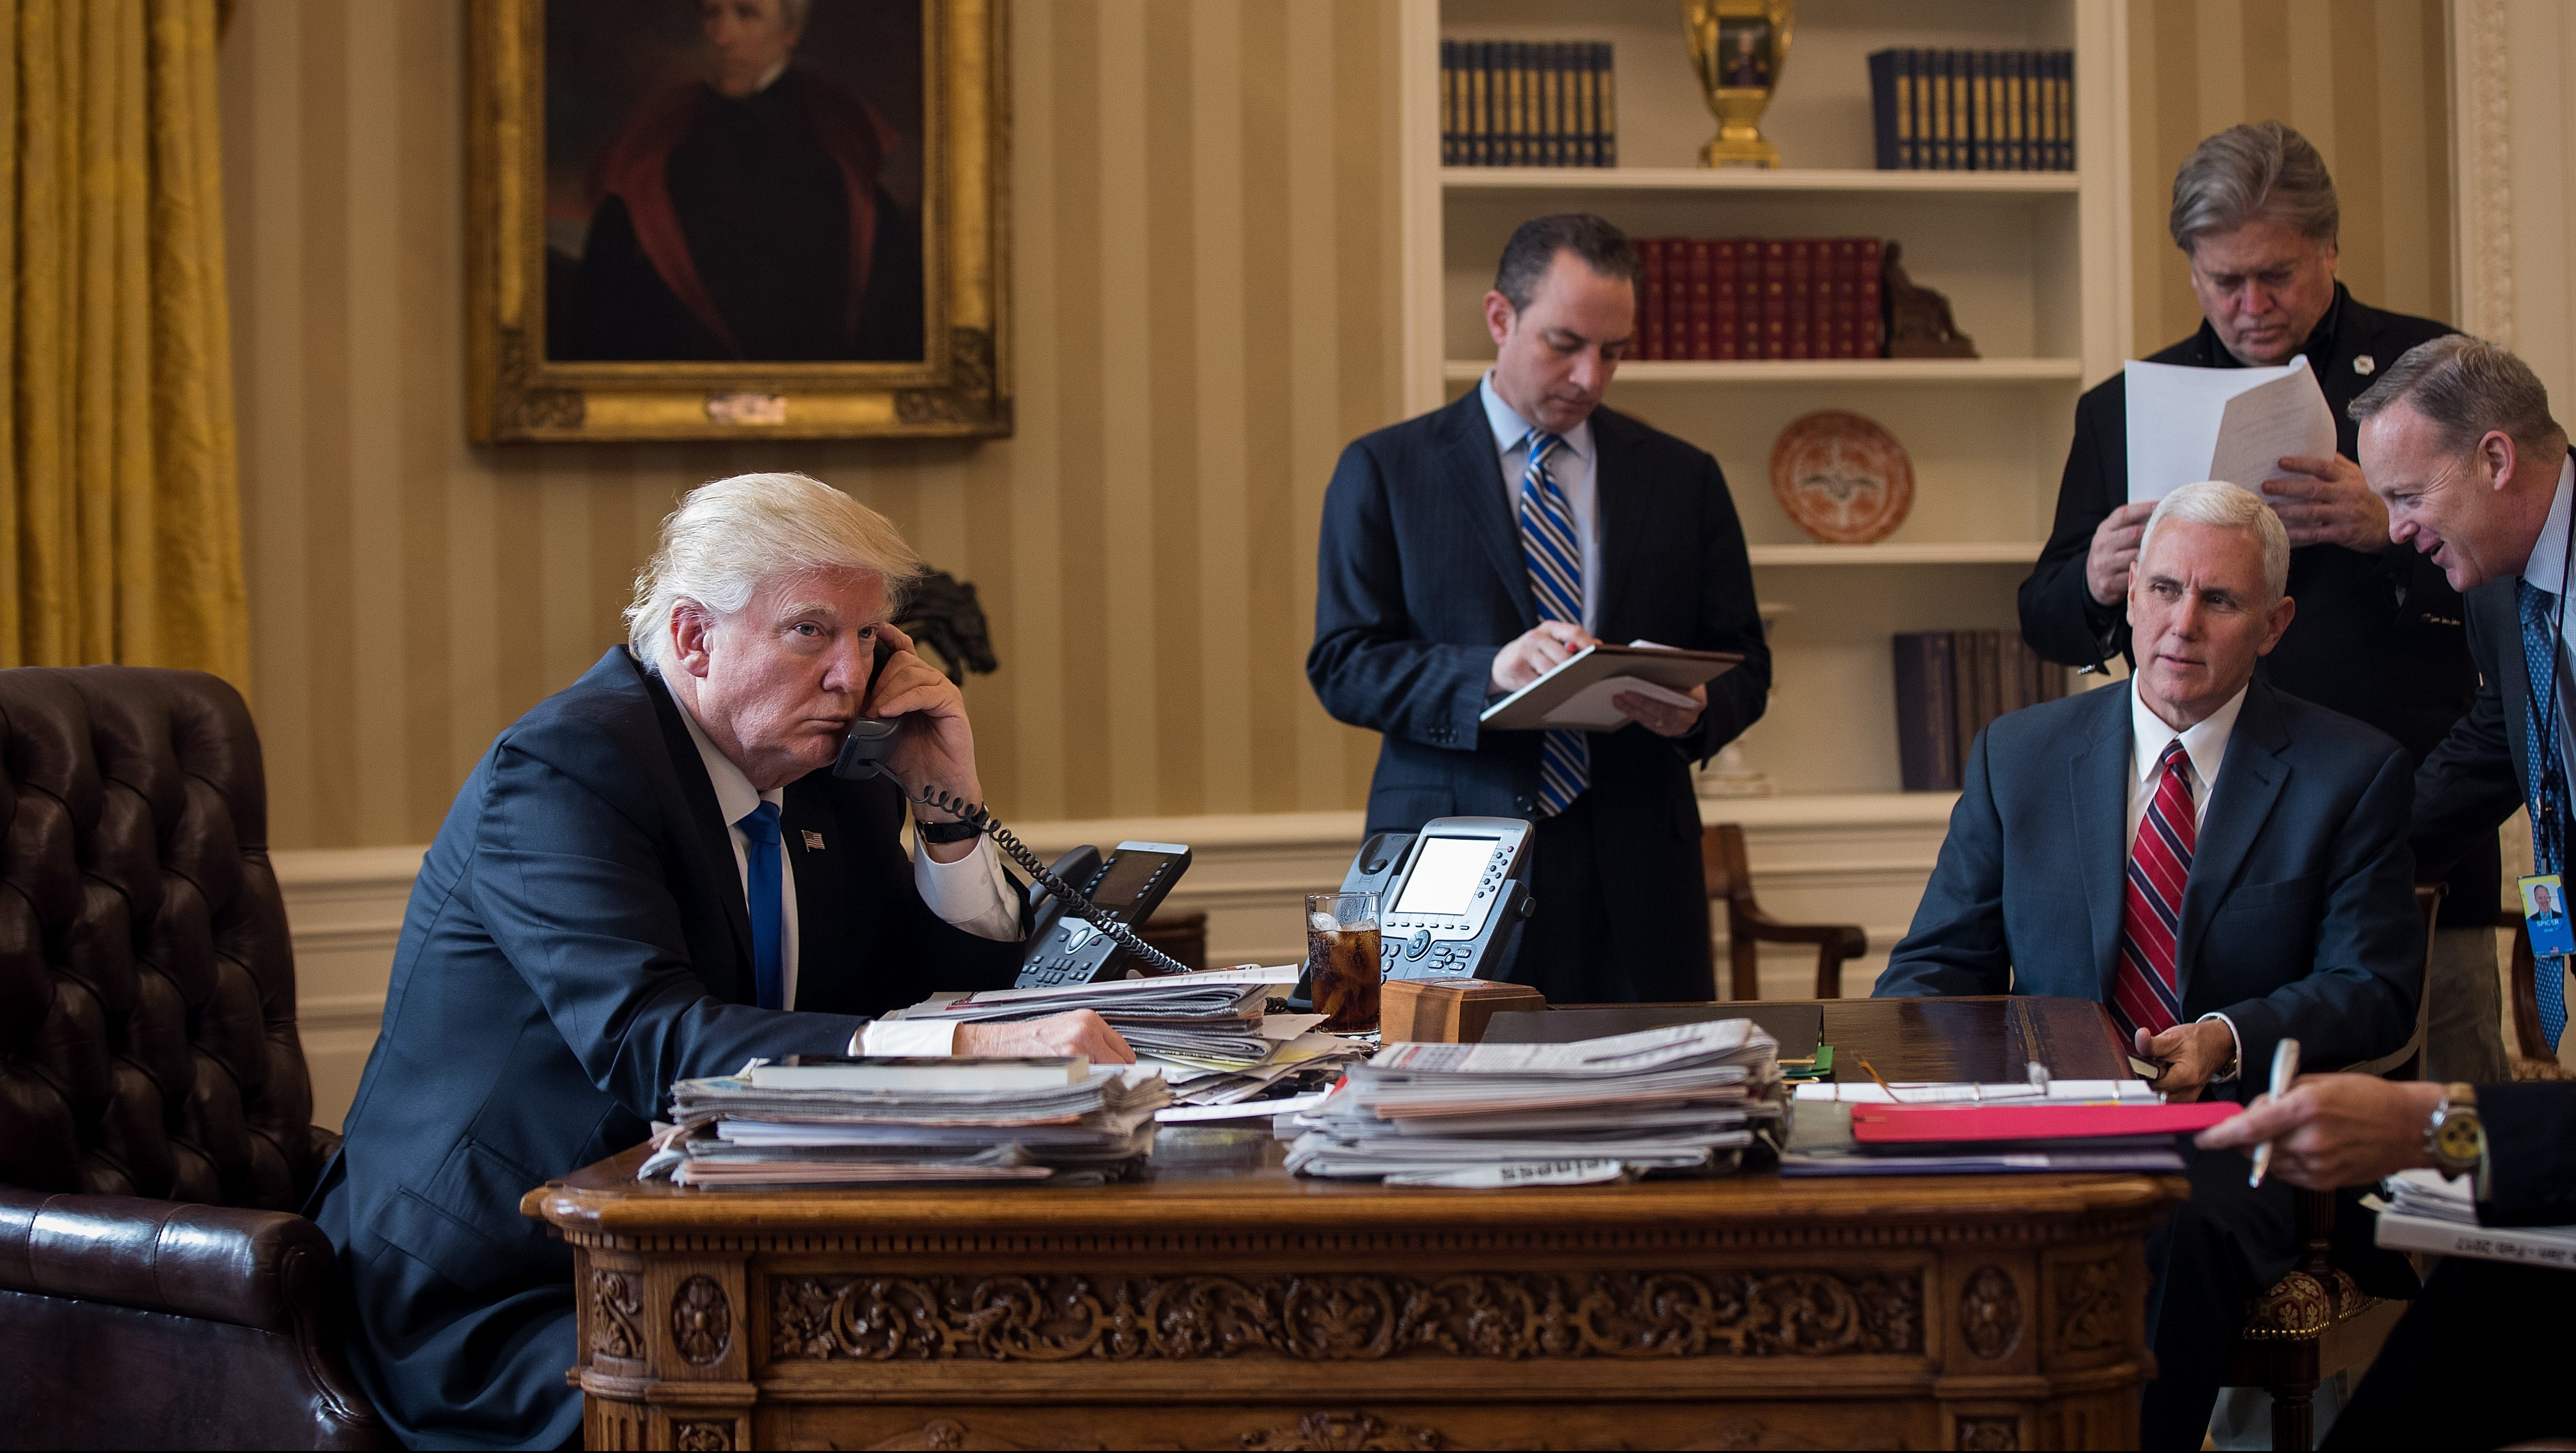 Donald Trump staff, Donald Trump staff salary, Sean Spicer Salary